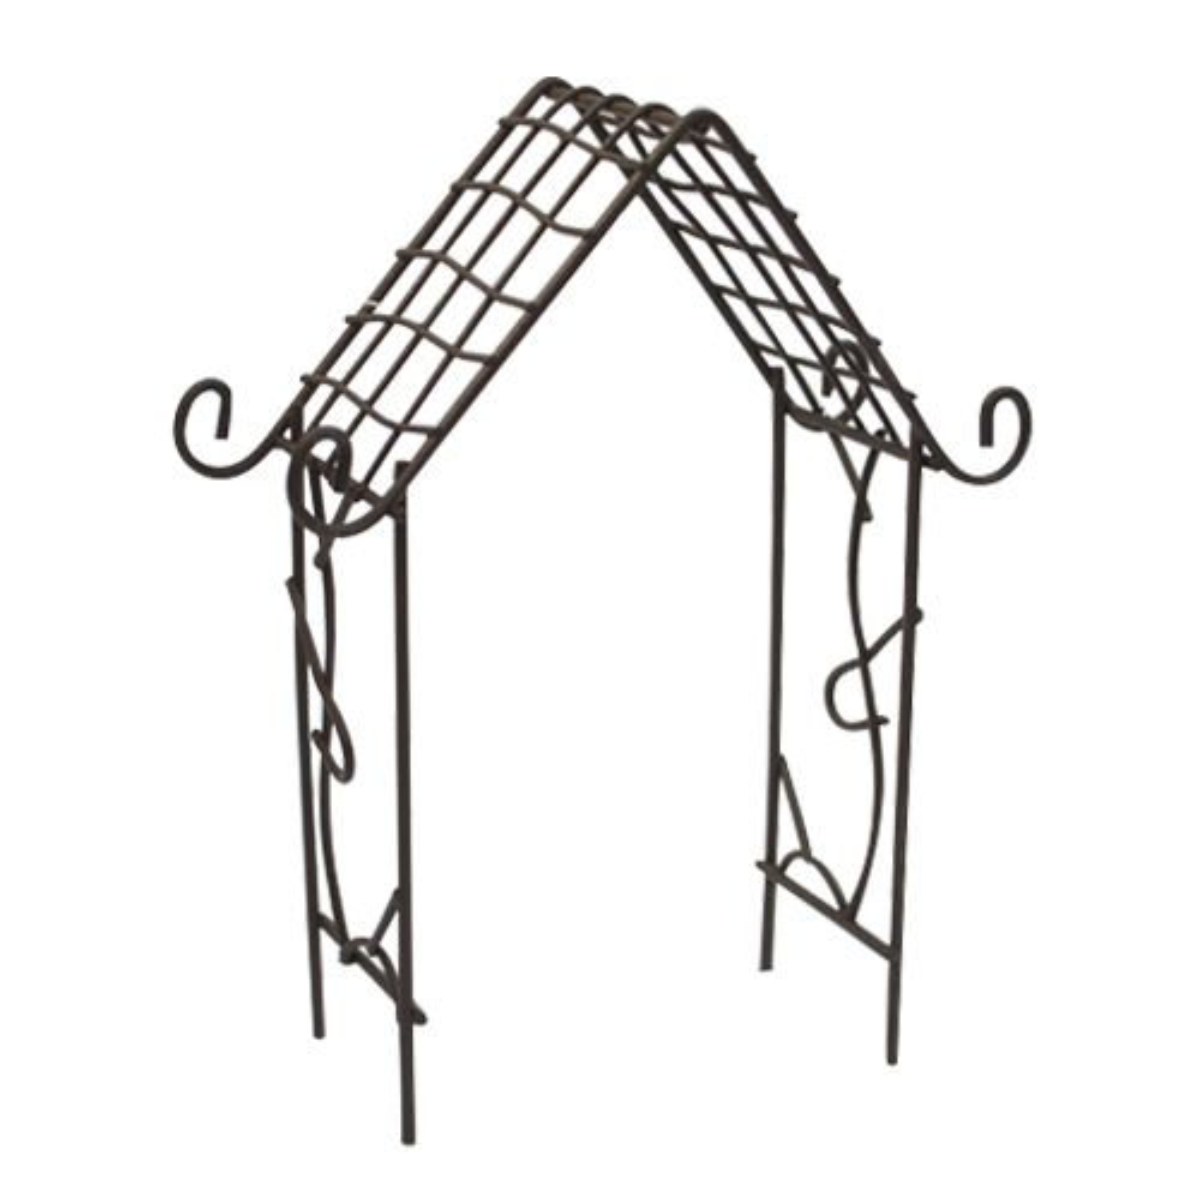 SCB271022 Металлическая мини арка-домик, коричневая, 9,5*15,5 см, ScrapBerry's